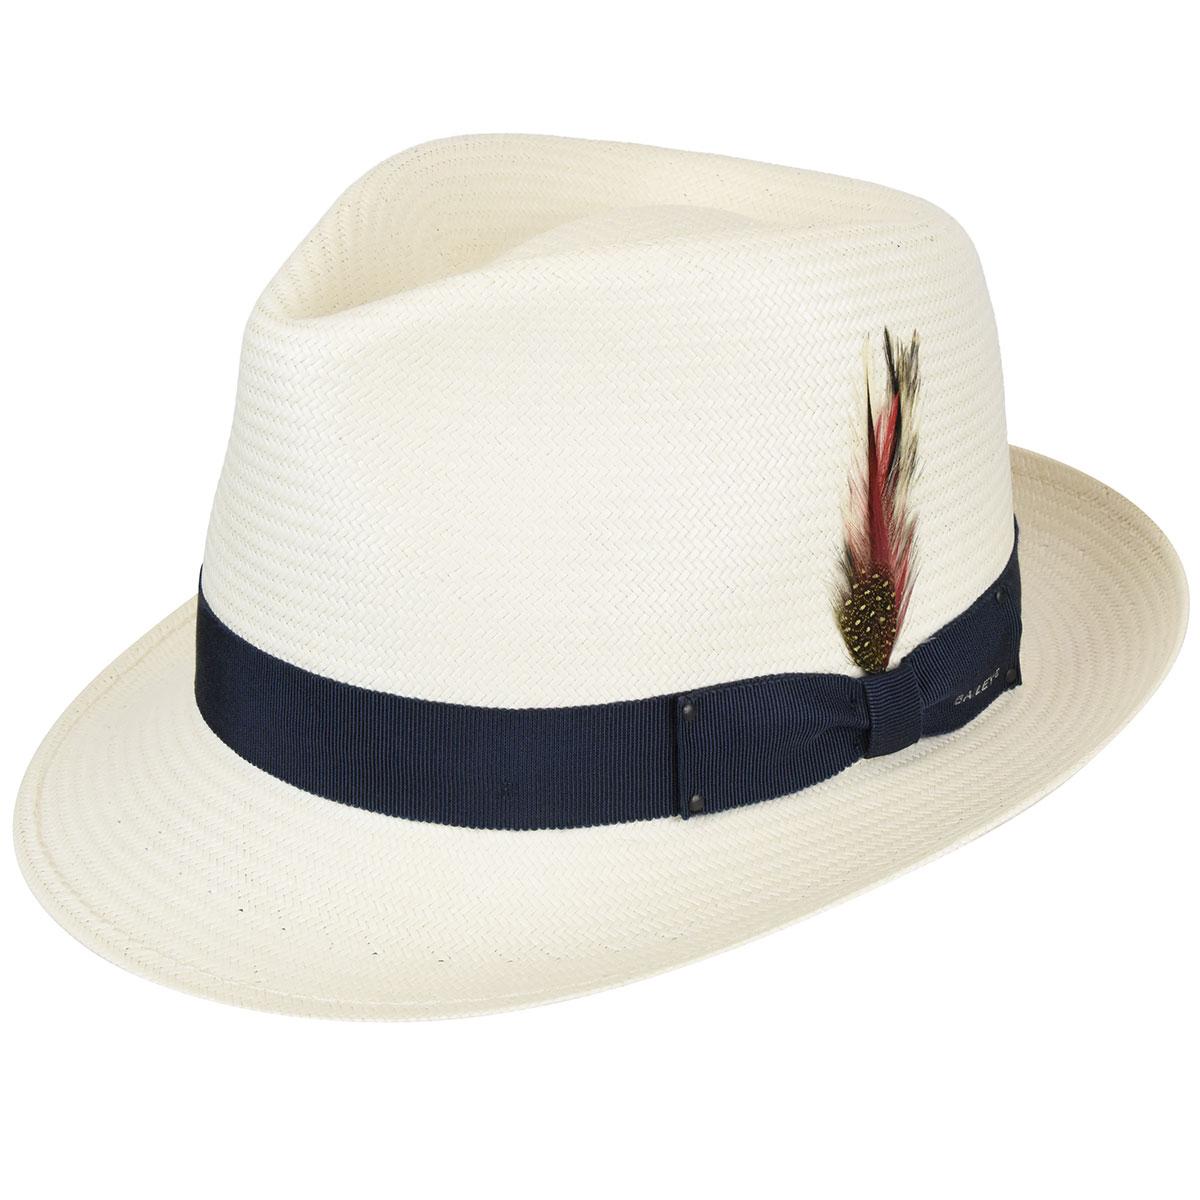 Men's Vintage Style Hats, Retro Hats Guthrie LitestrawFedora $130.00 AT vintagedancer.com